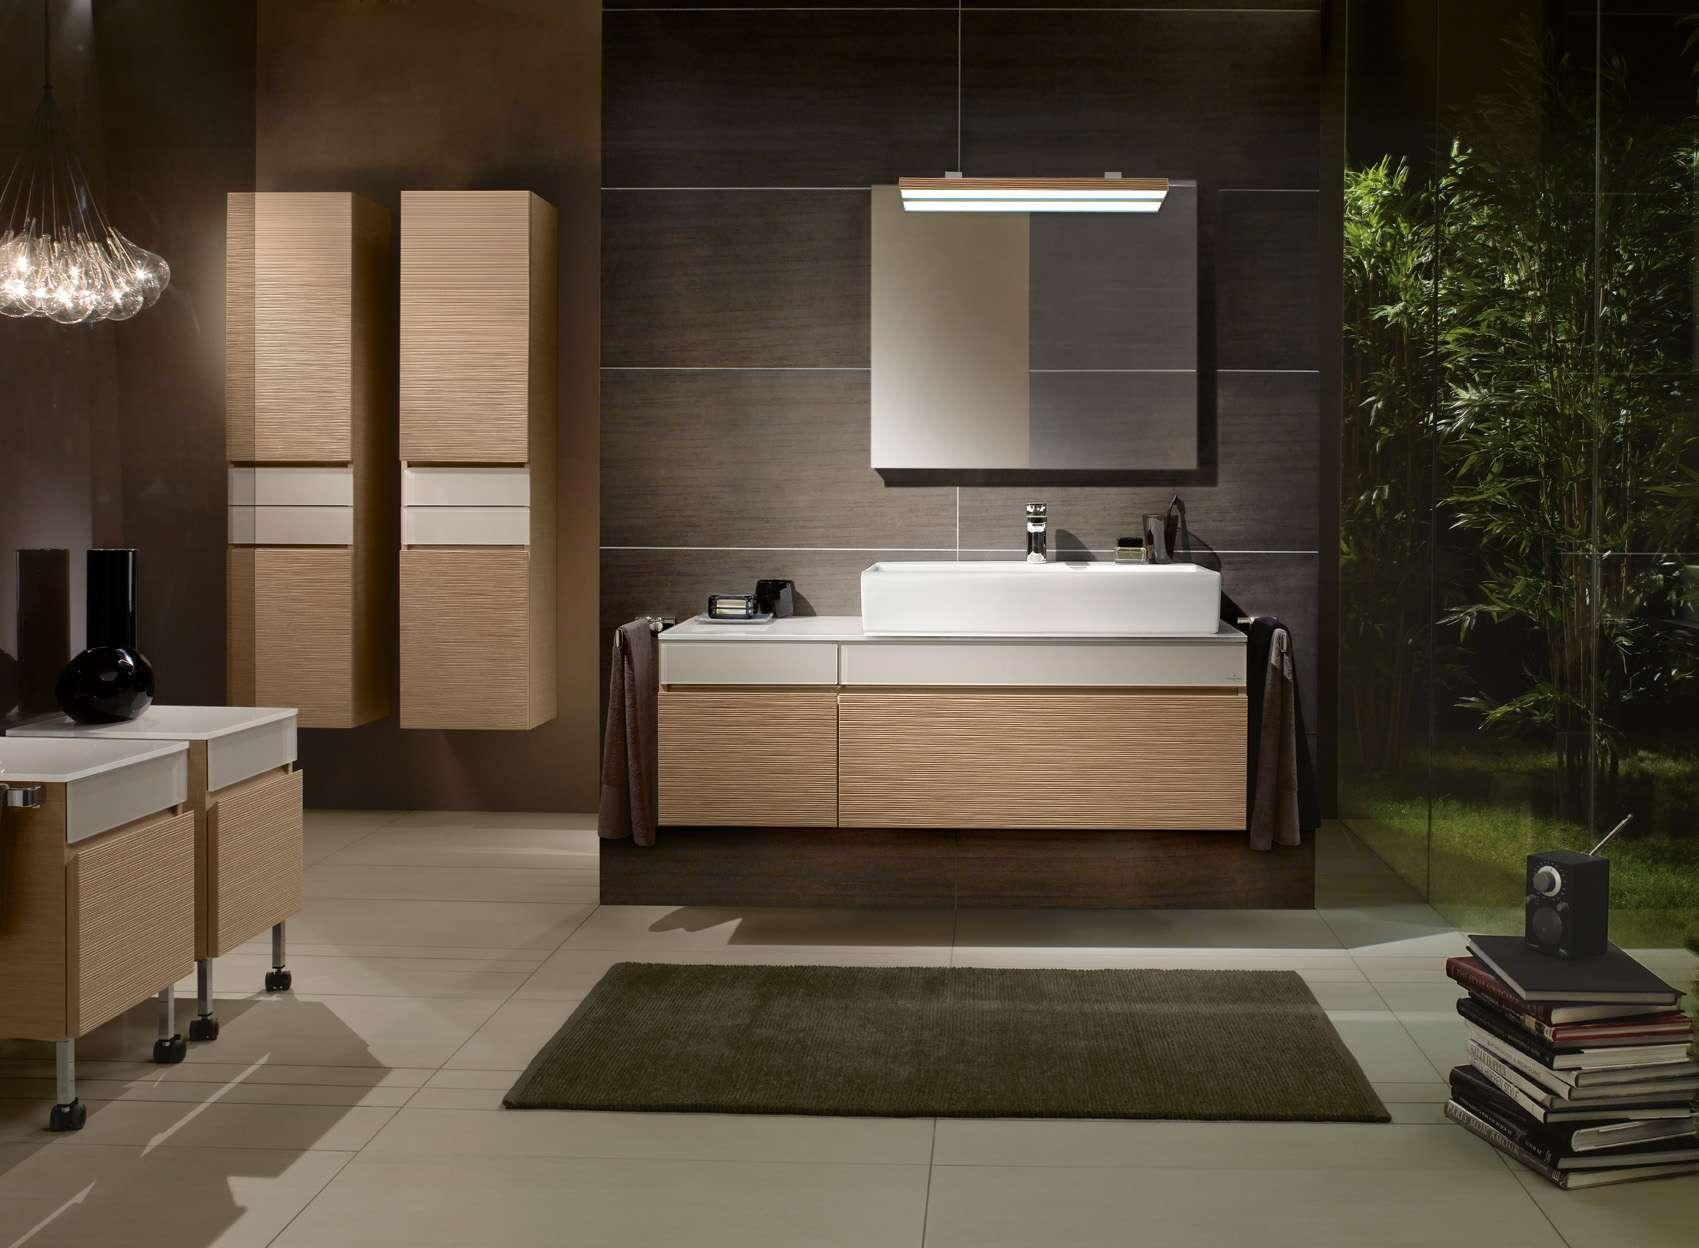 villeroy boch bathroom kitchen tiles division - lentine marine | #7851